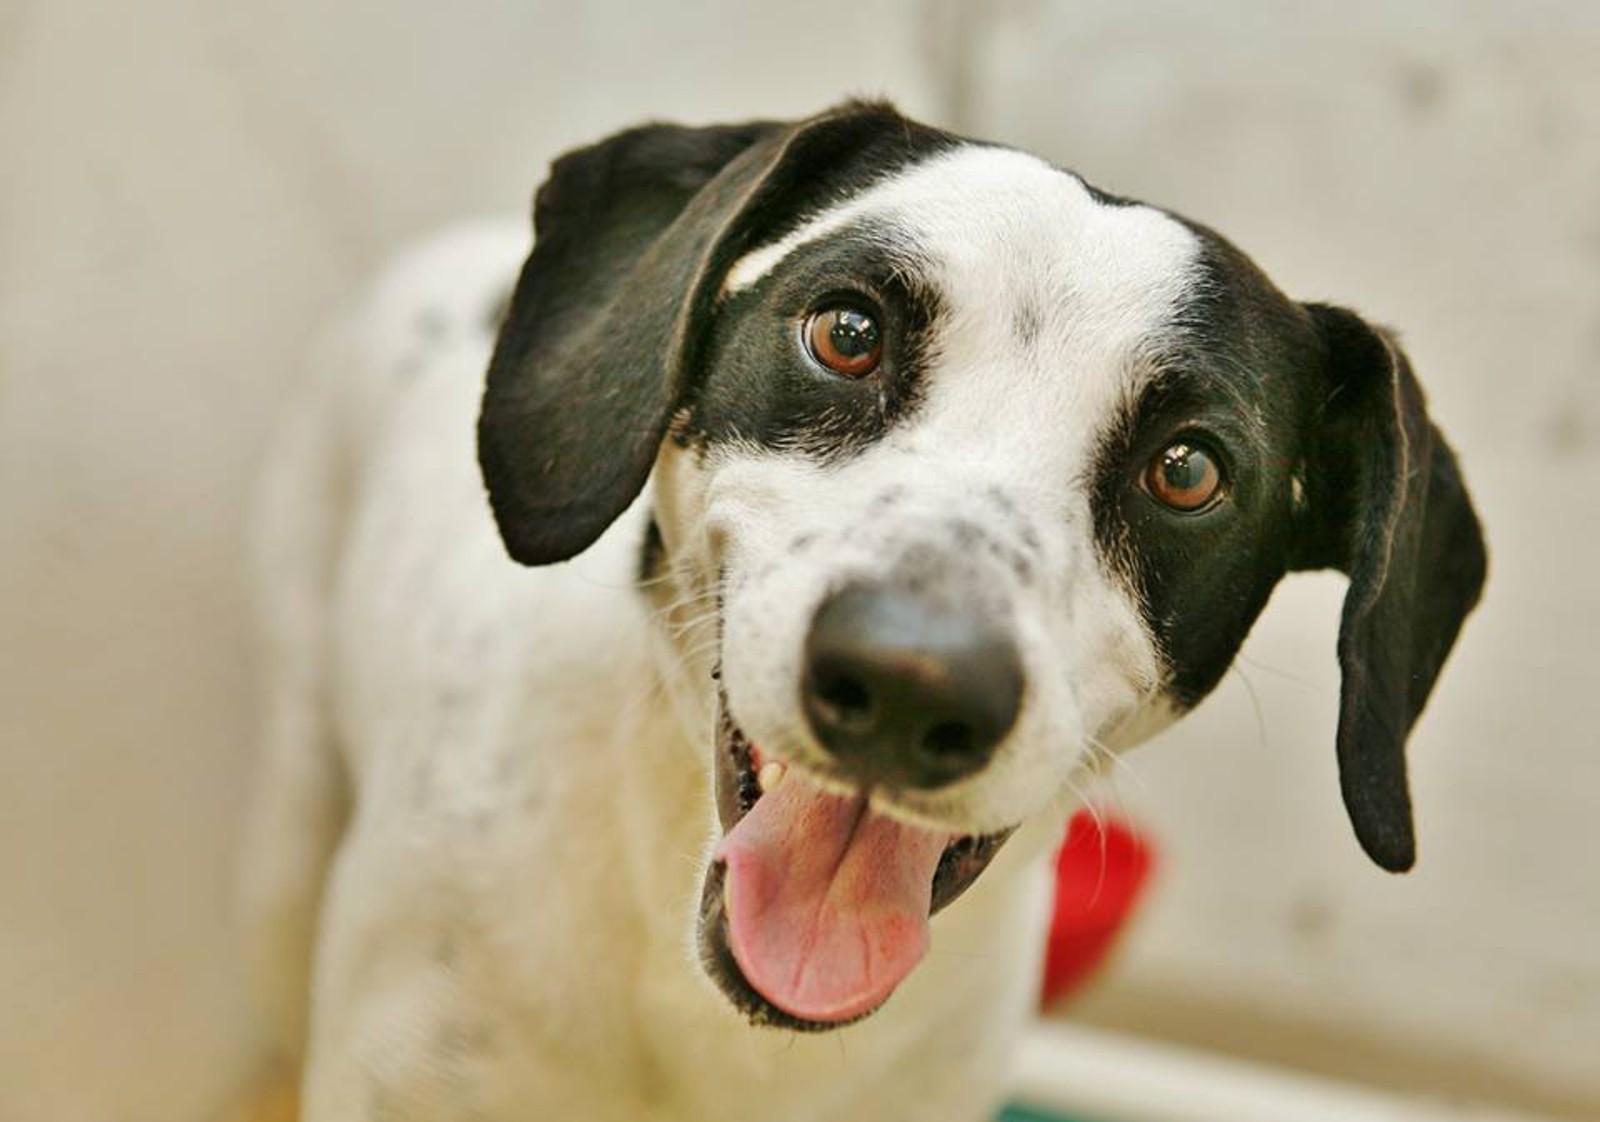 5 Reasons Why Everyone Should Adopt a Pet